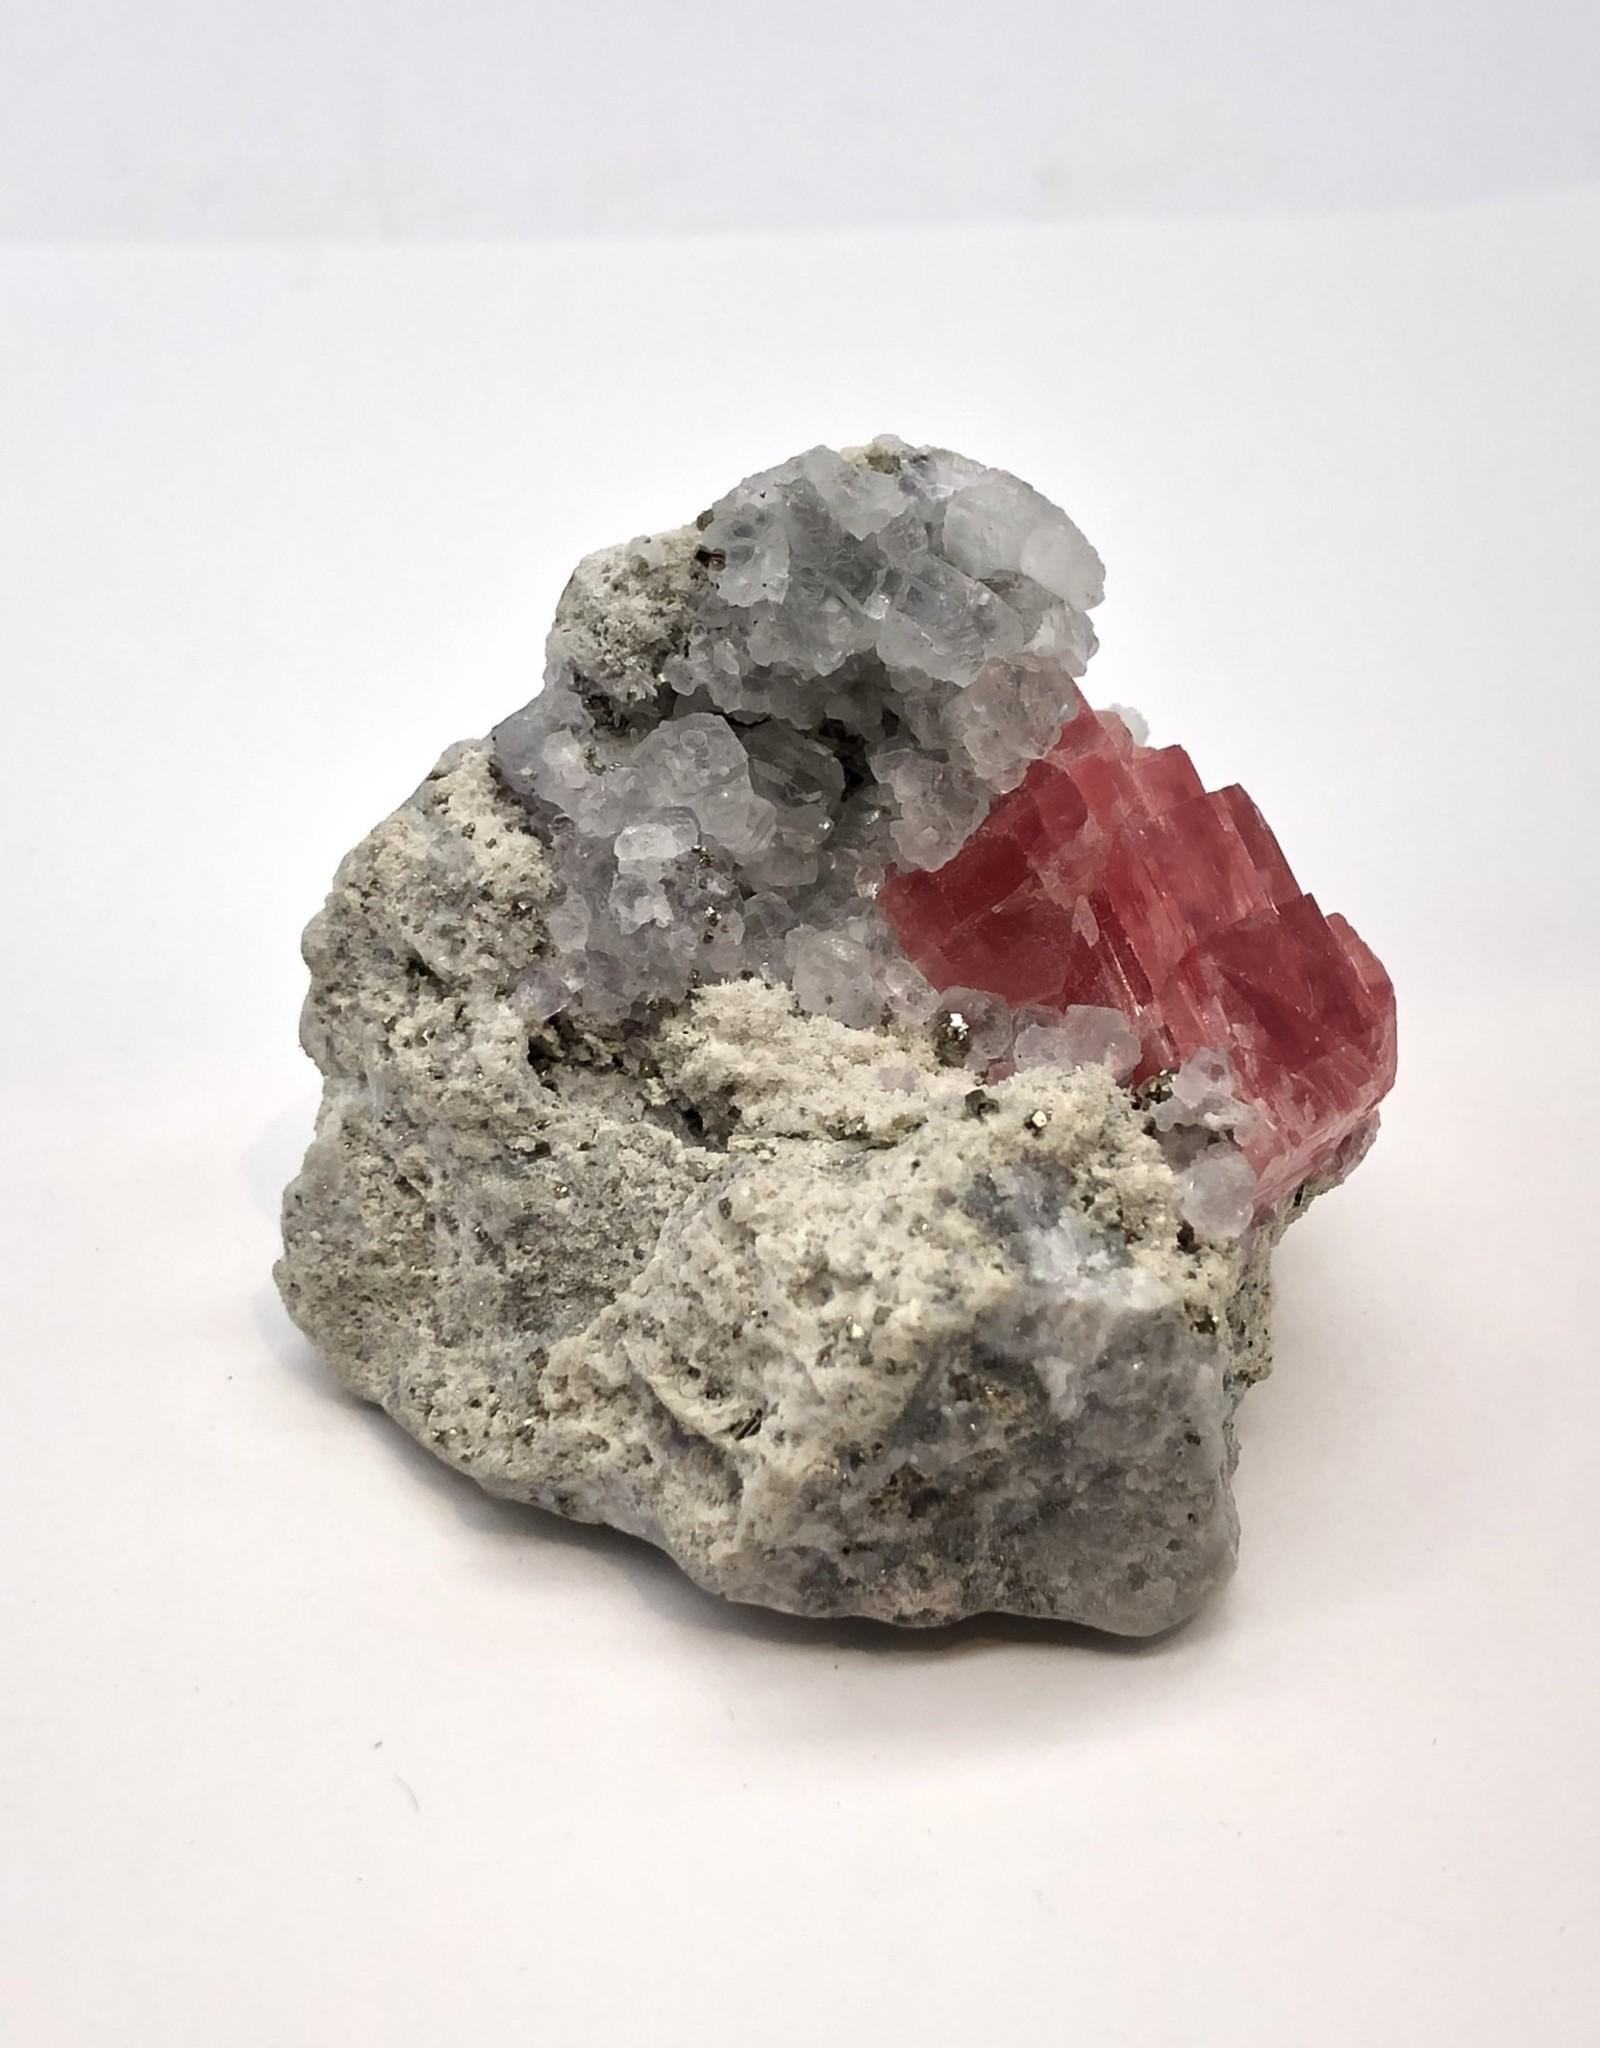 Rhodocrosite with Fluorite on Matrix - China 2004